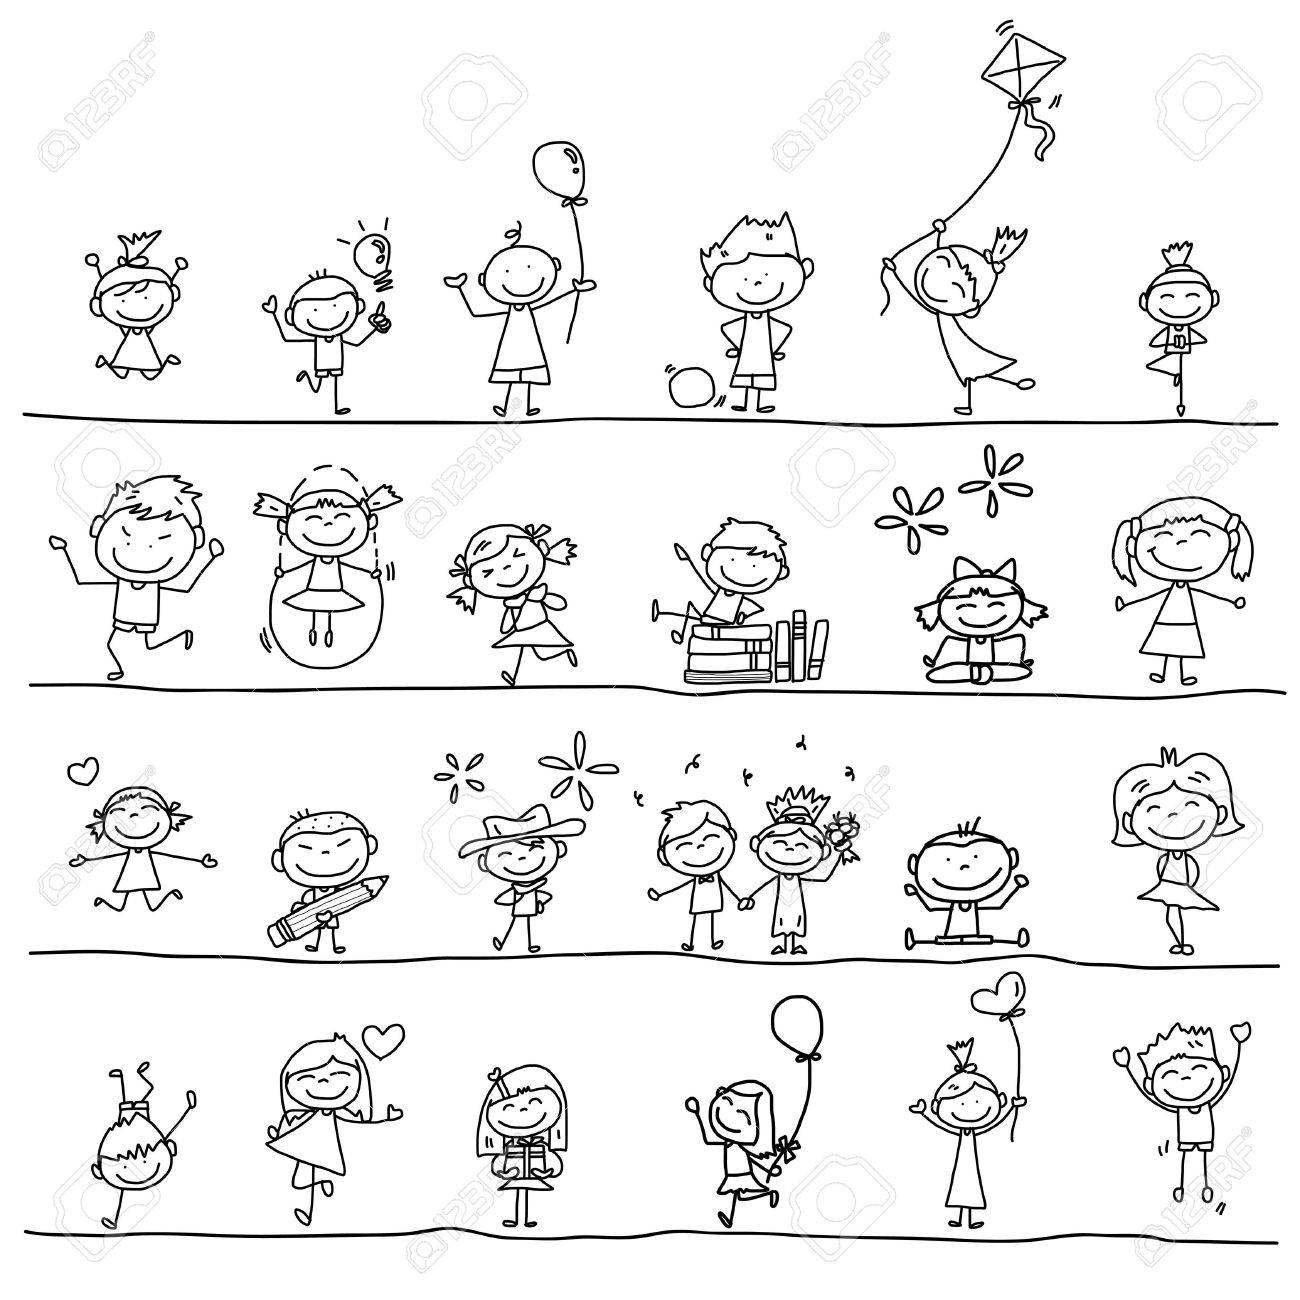 hand drawing cartoon happy kids playing - 21396893